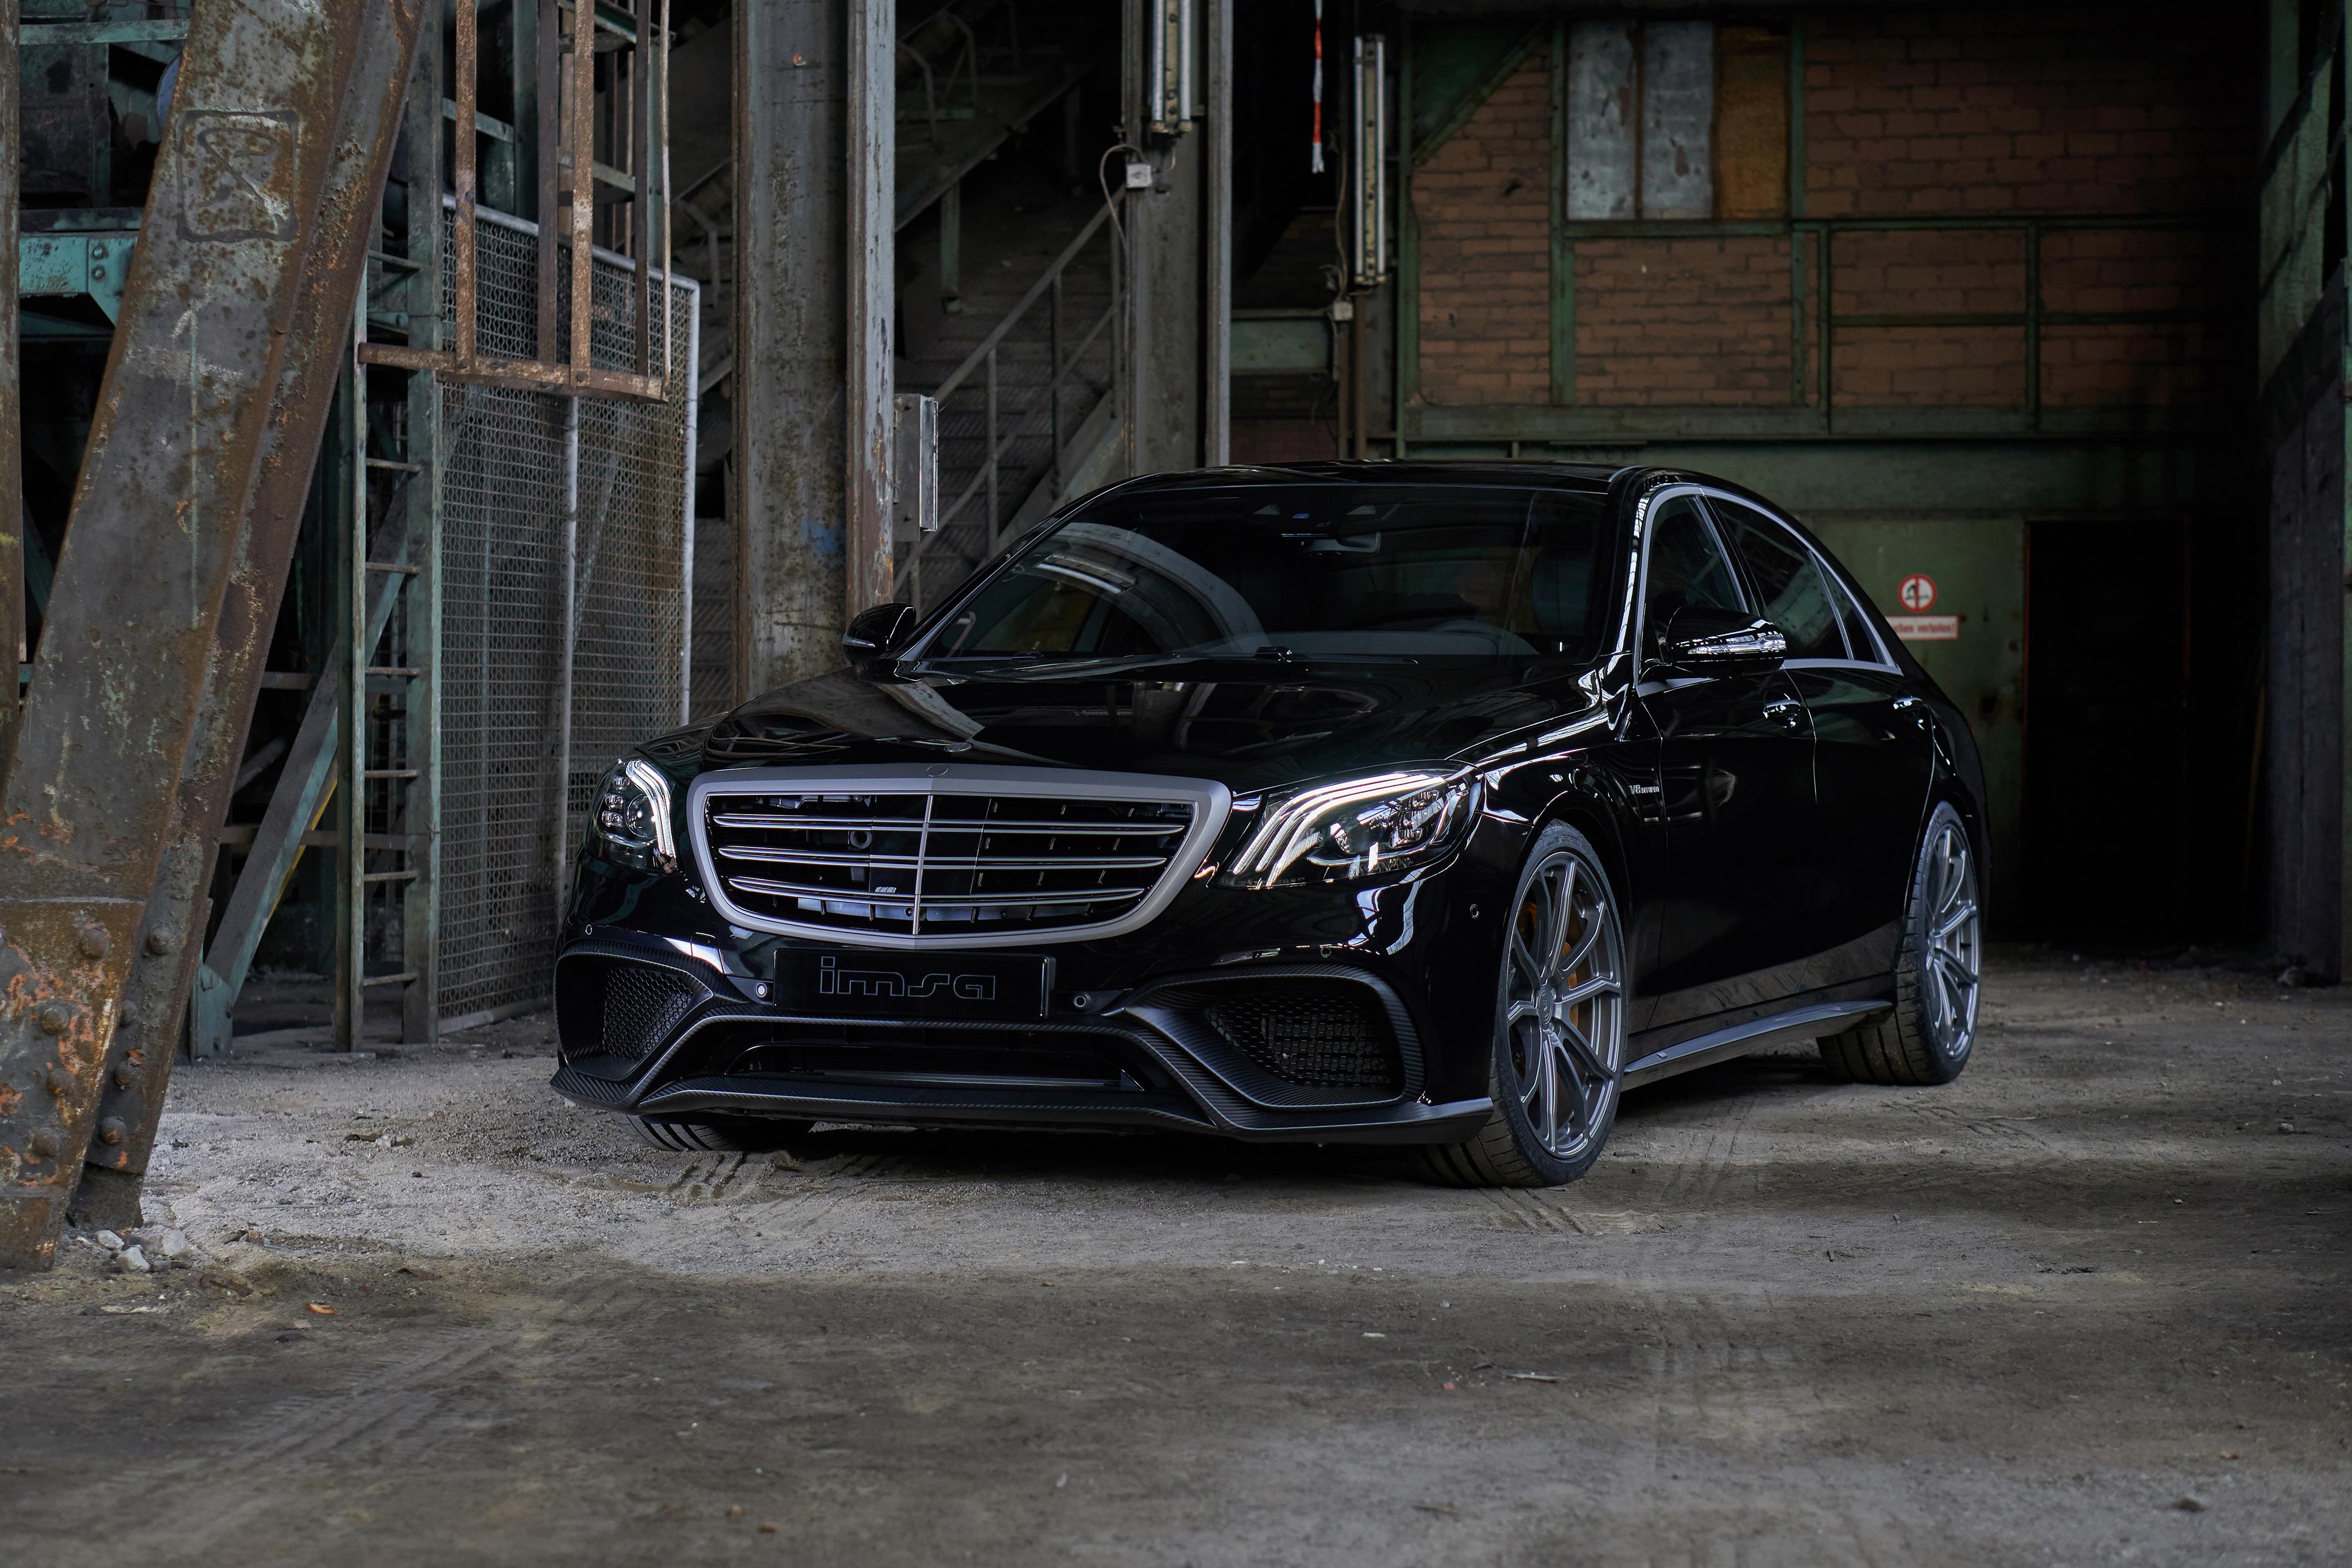 2048x1152 Imsa Mercedes Benz S Klasse 2018 2048x1152 Resolution Hd Images, Photos, Reviews